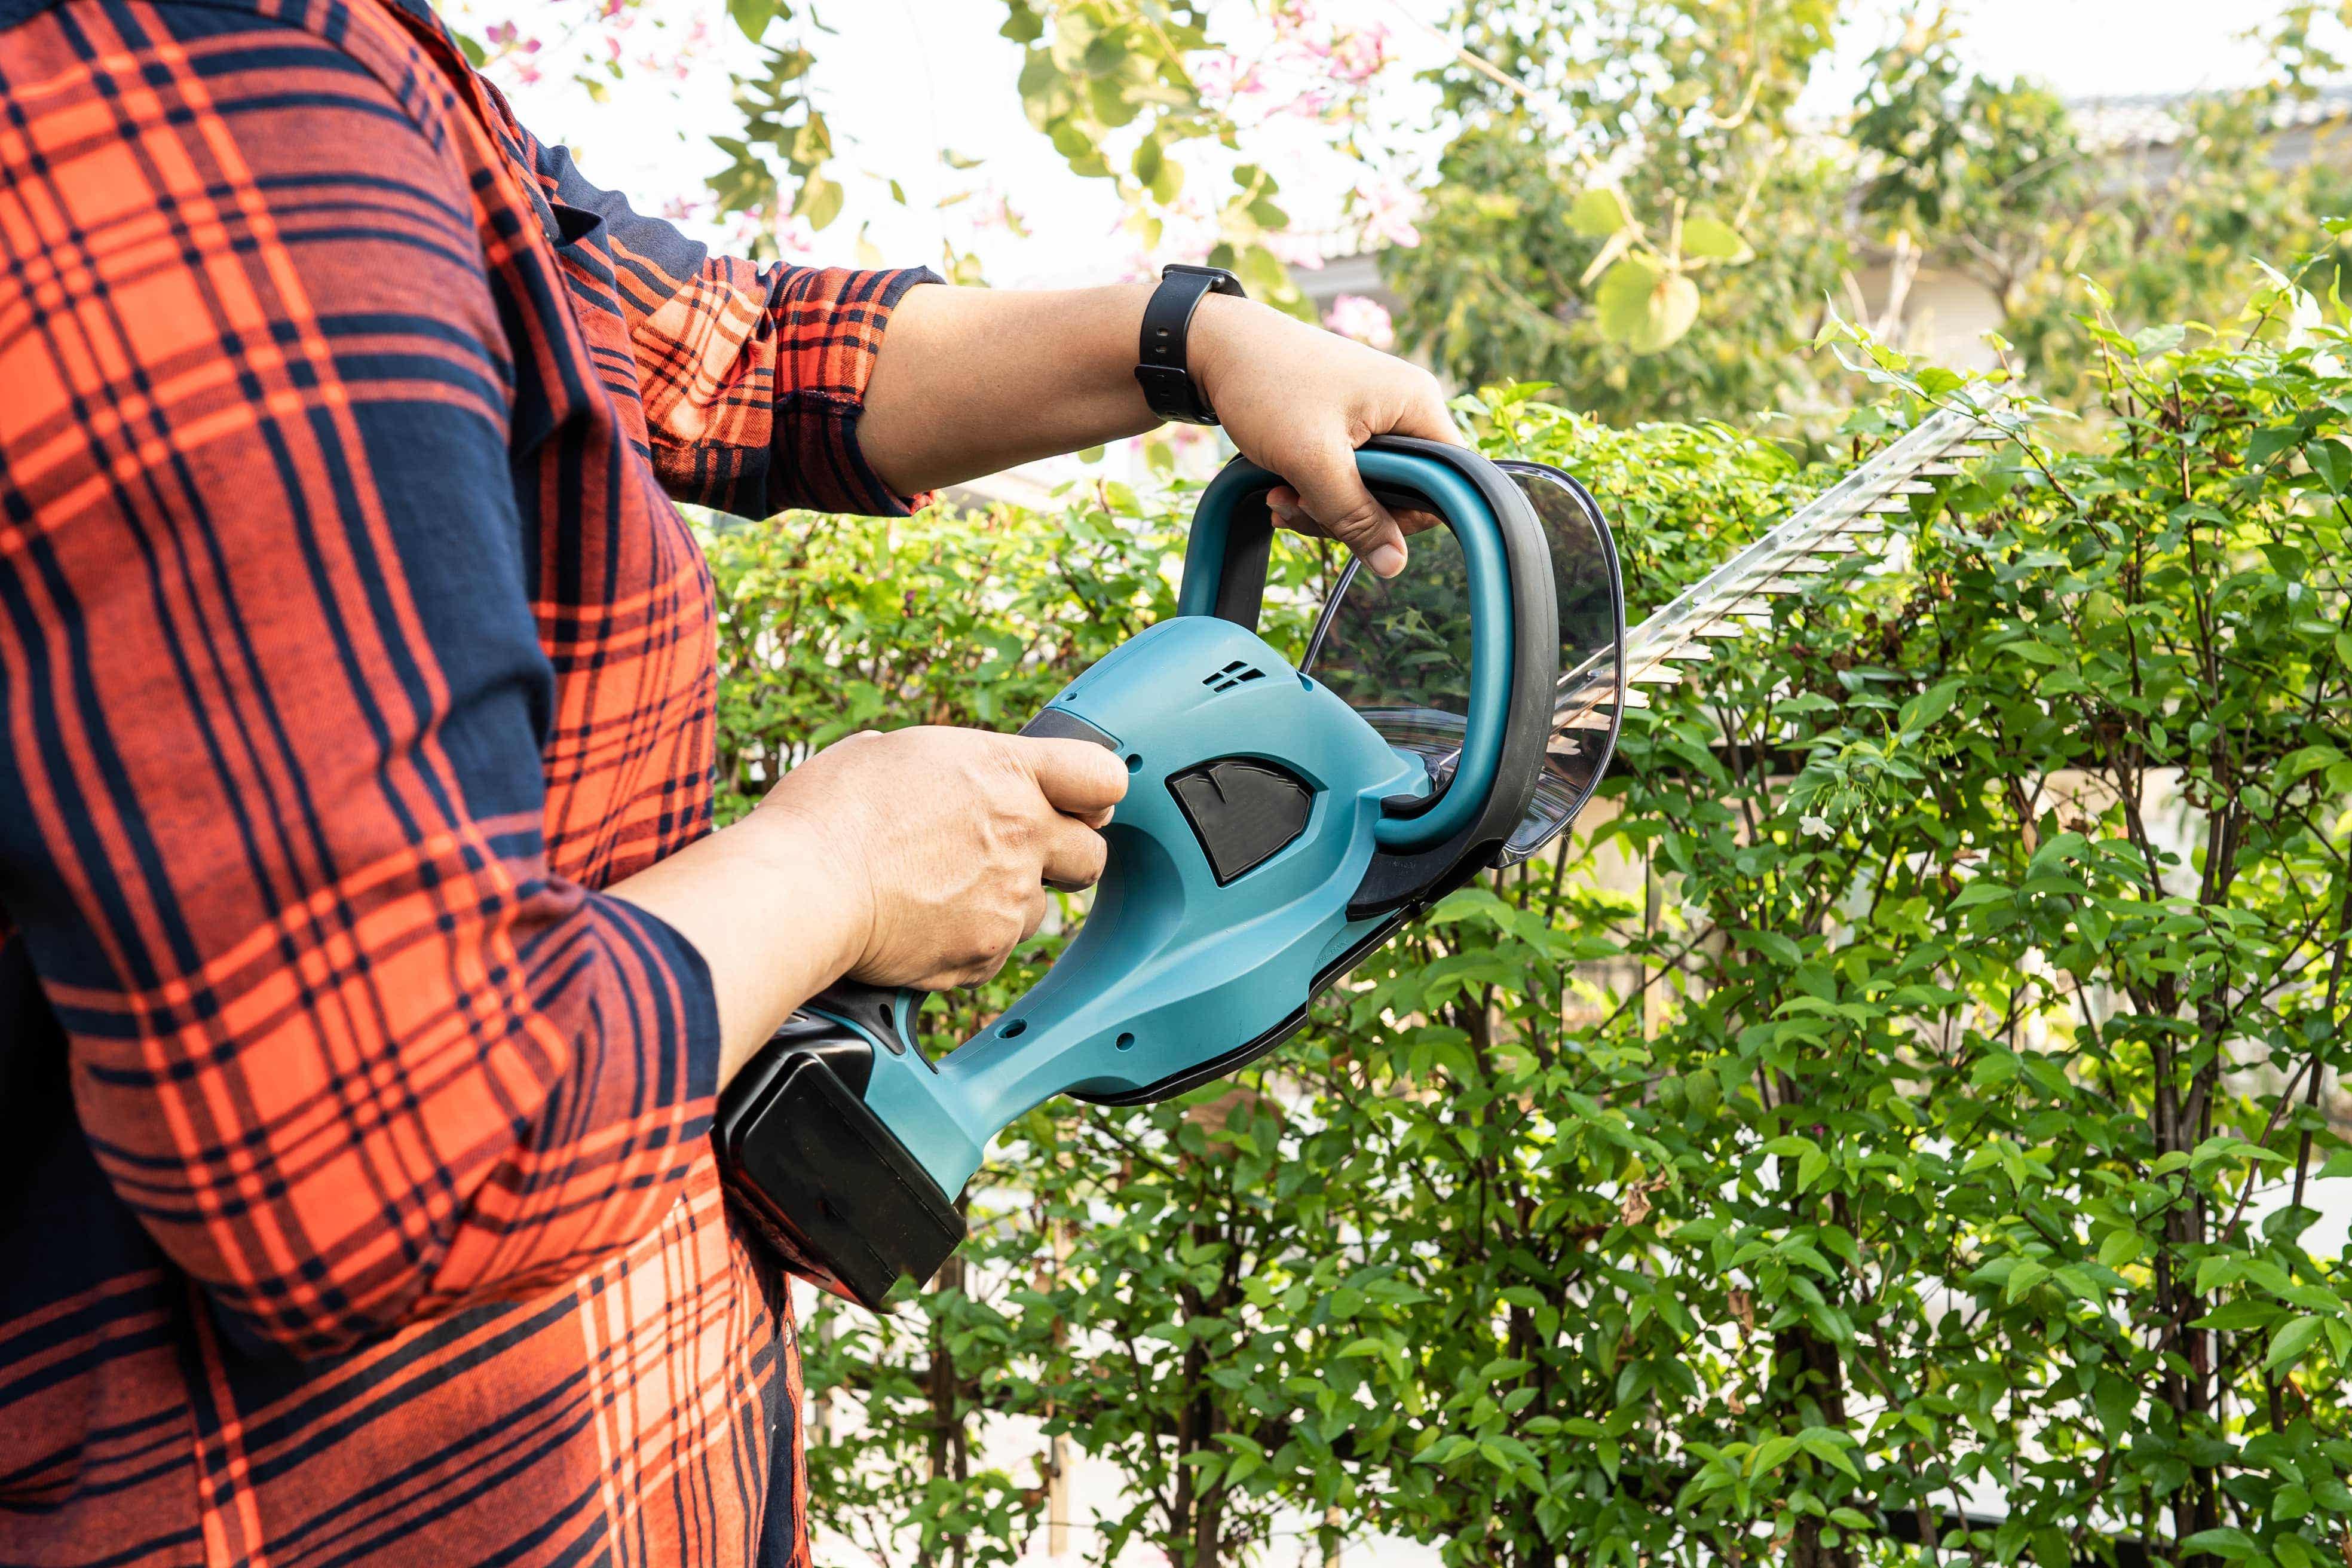 Gardener using electric hedge trimmer